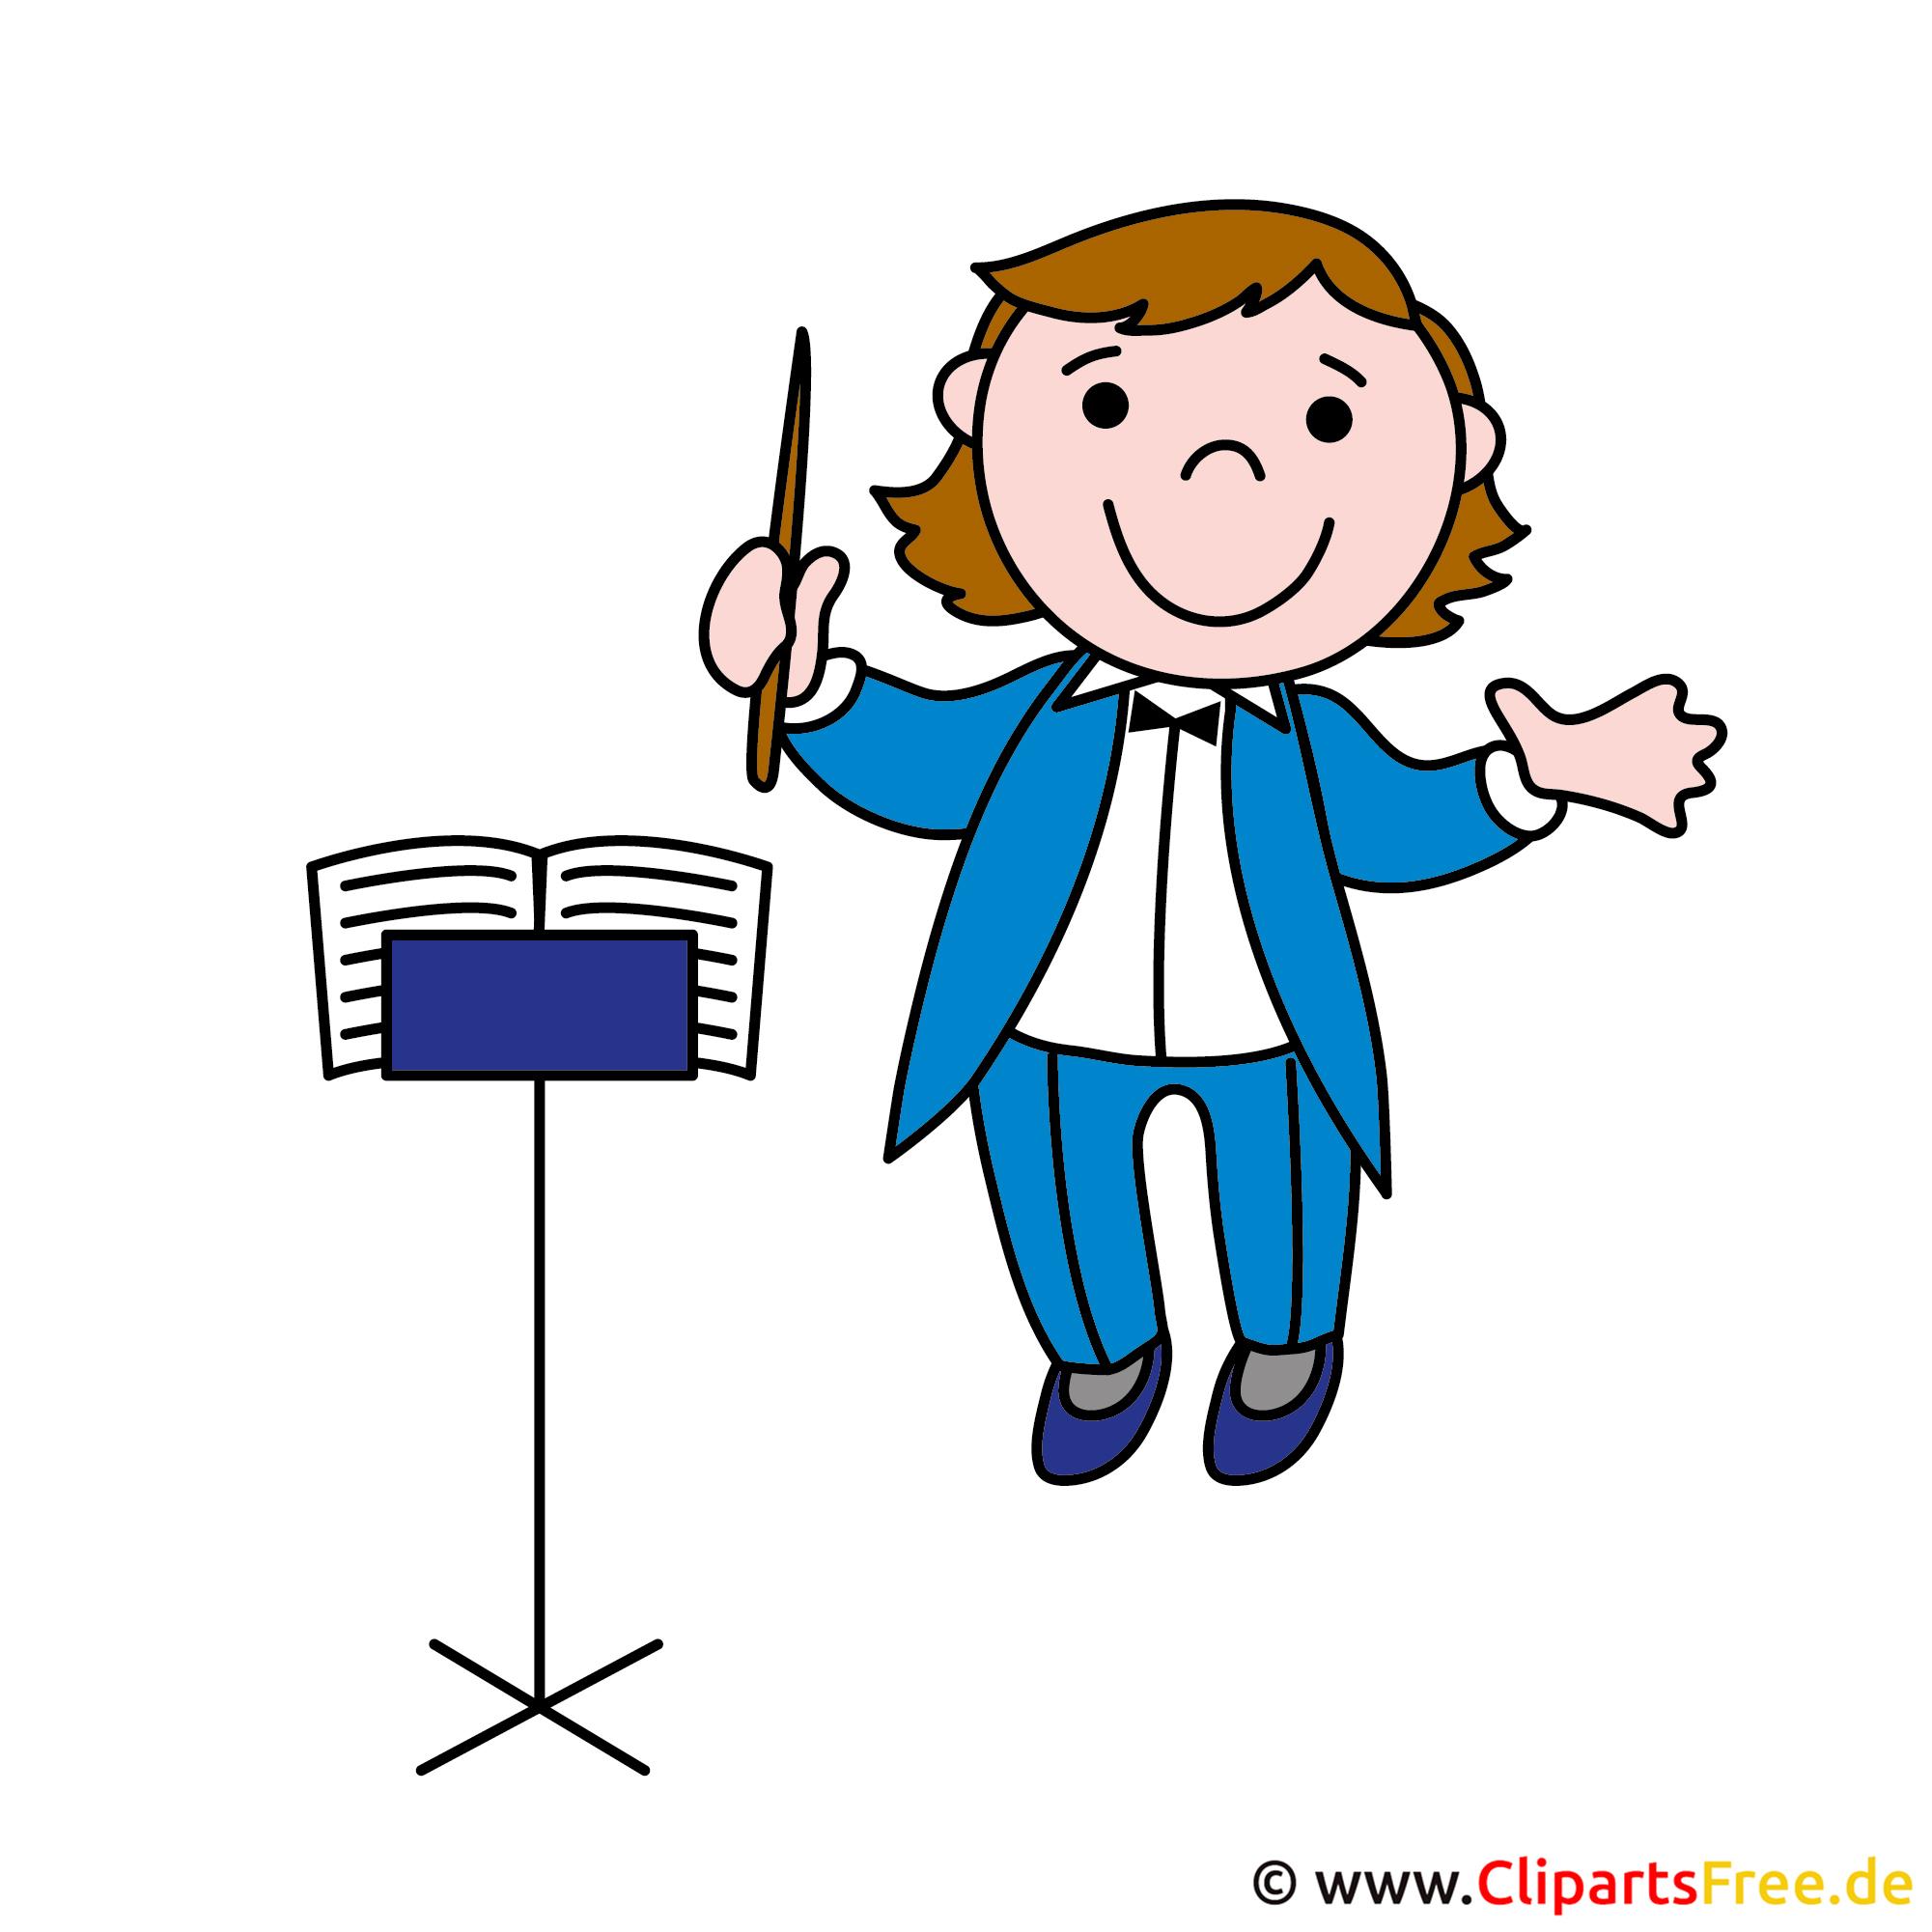 Dirigent, Musiker Clipart-Bild - Berufe Bilder